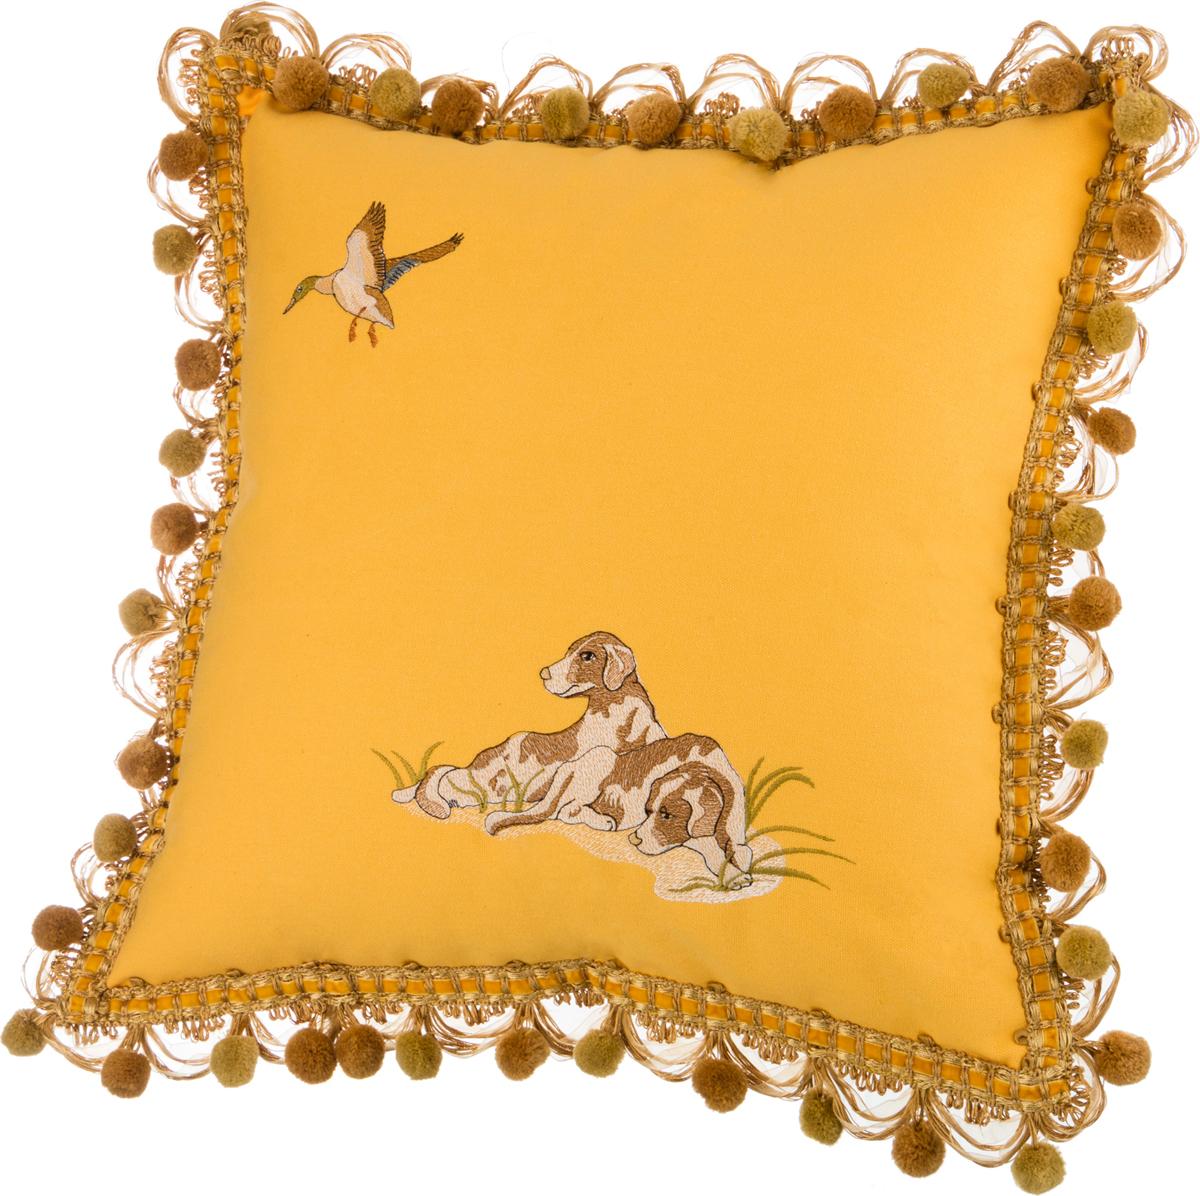 Декоративные подушки Santalino Декоративная подушка Охота Цвет: Жёлтый (45х45) декоративные подушки santalino декоративная подушка гуси 45х45